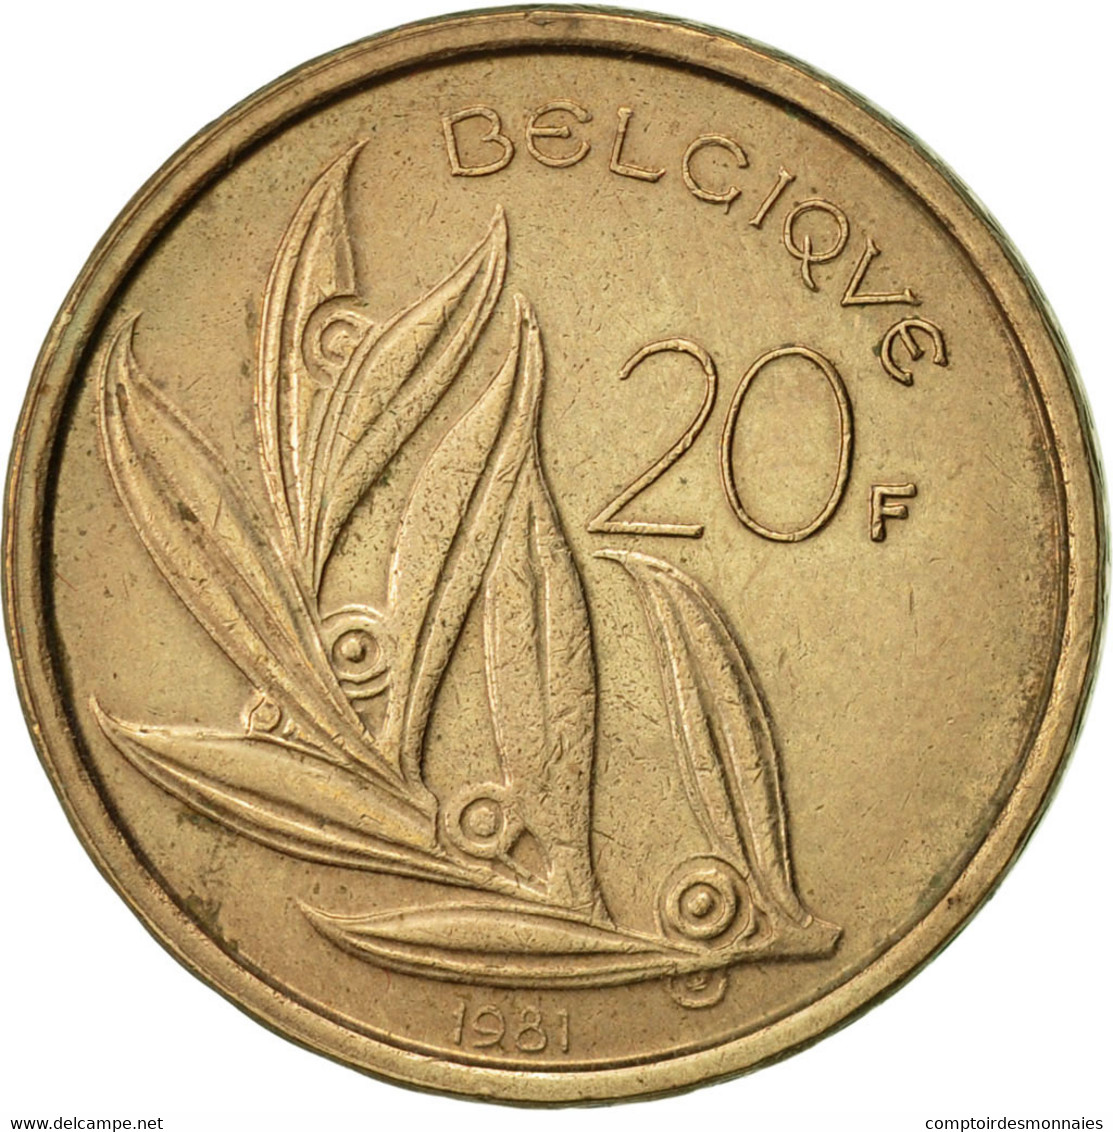 Belgique, 20 Francs, 20 Frank, 1981, TTB+, Nickel-Bronze, KM:159 - 1951-1993: Baudouin I